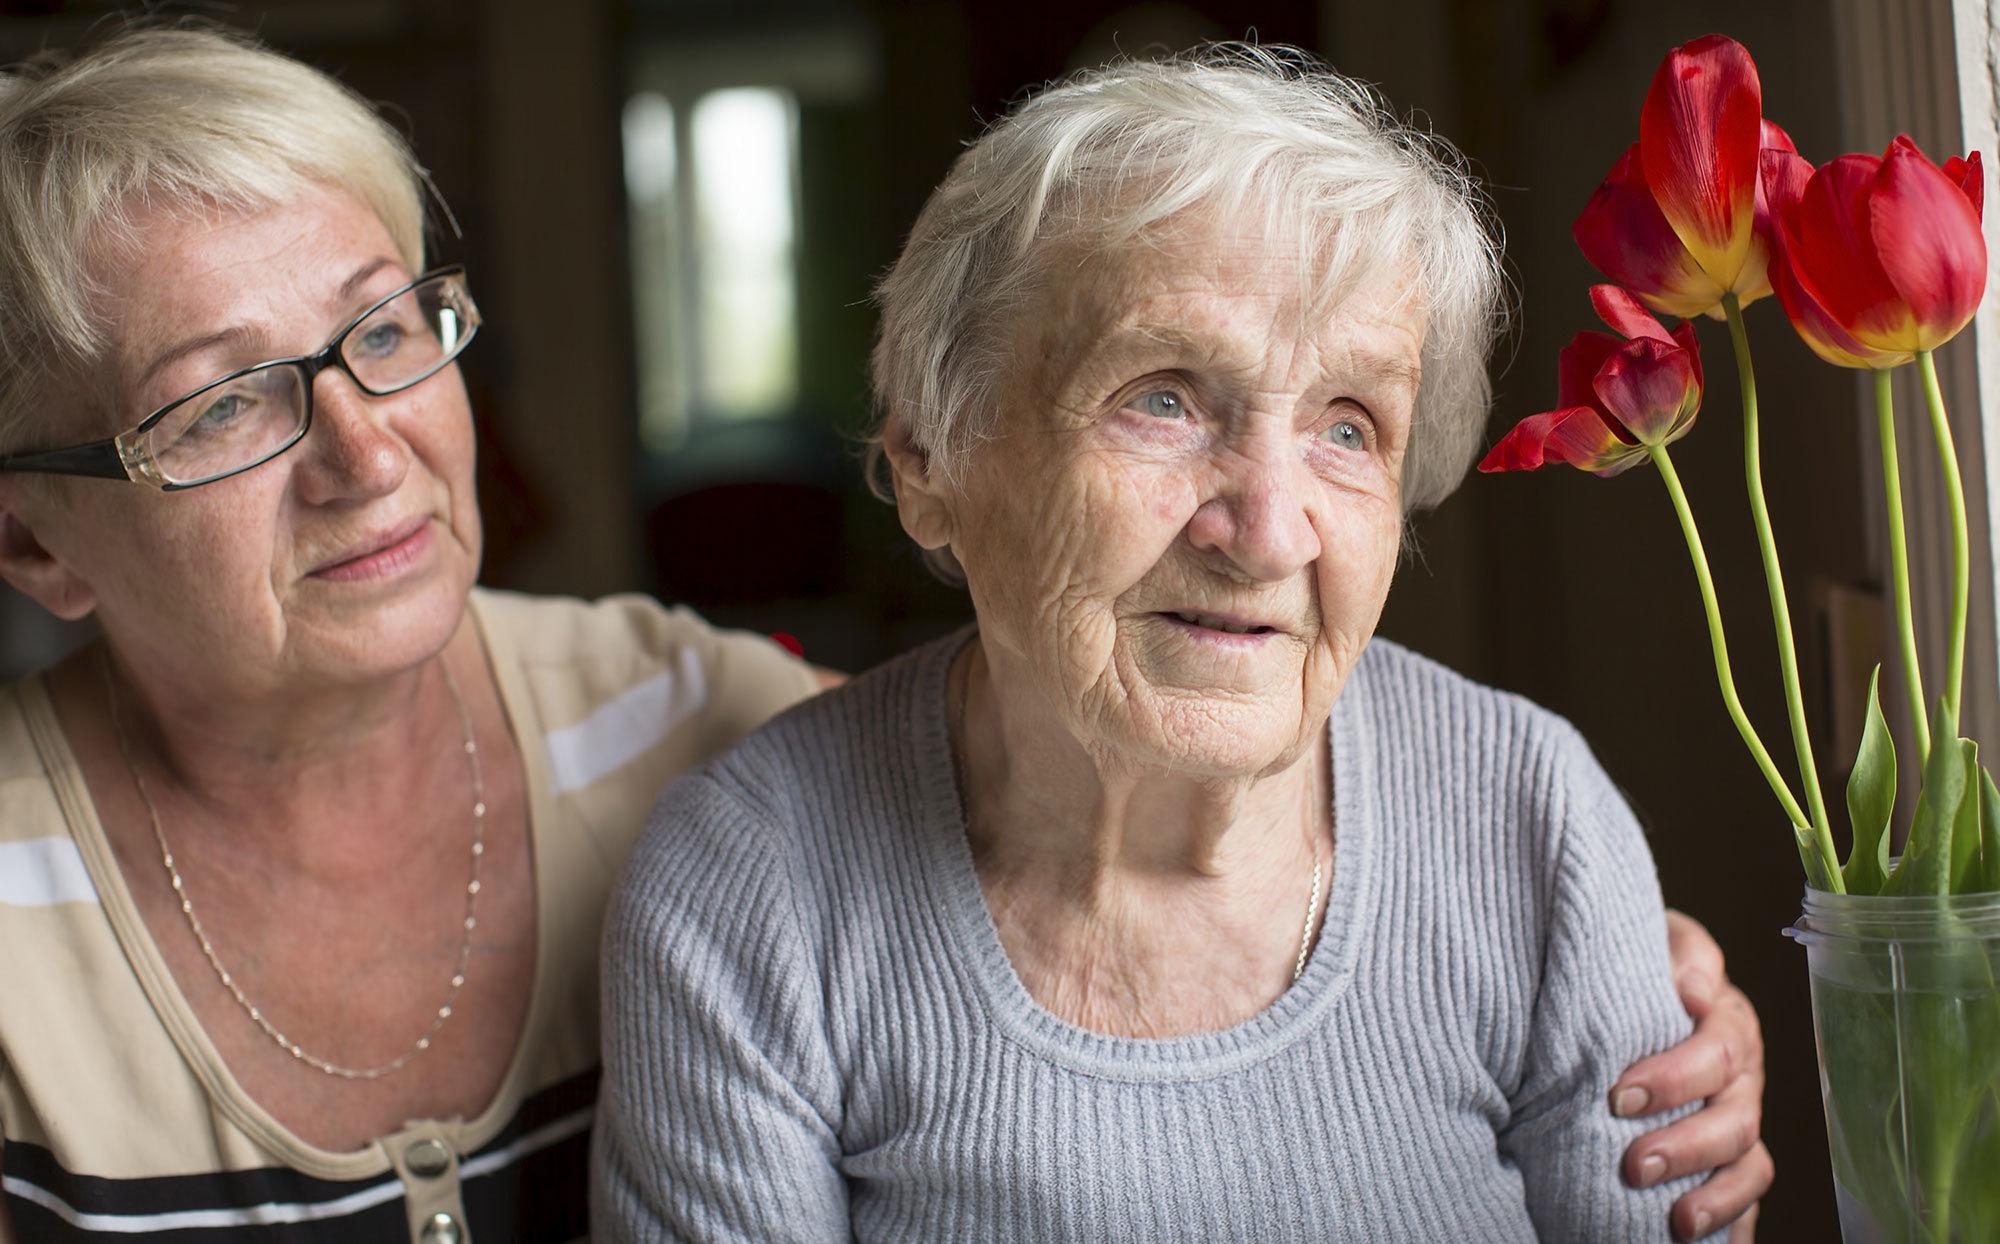 Older women with her carer (Source: Shutterstock)